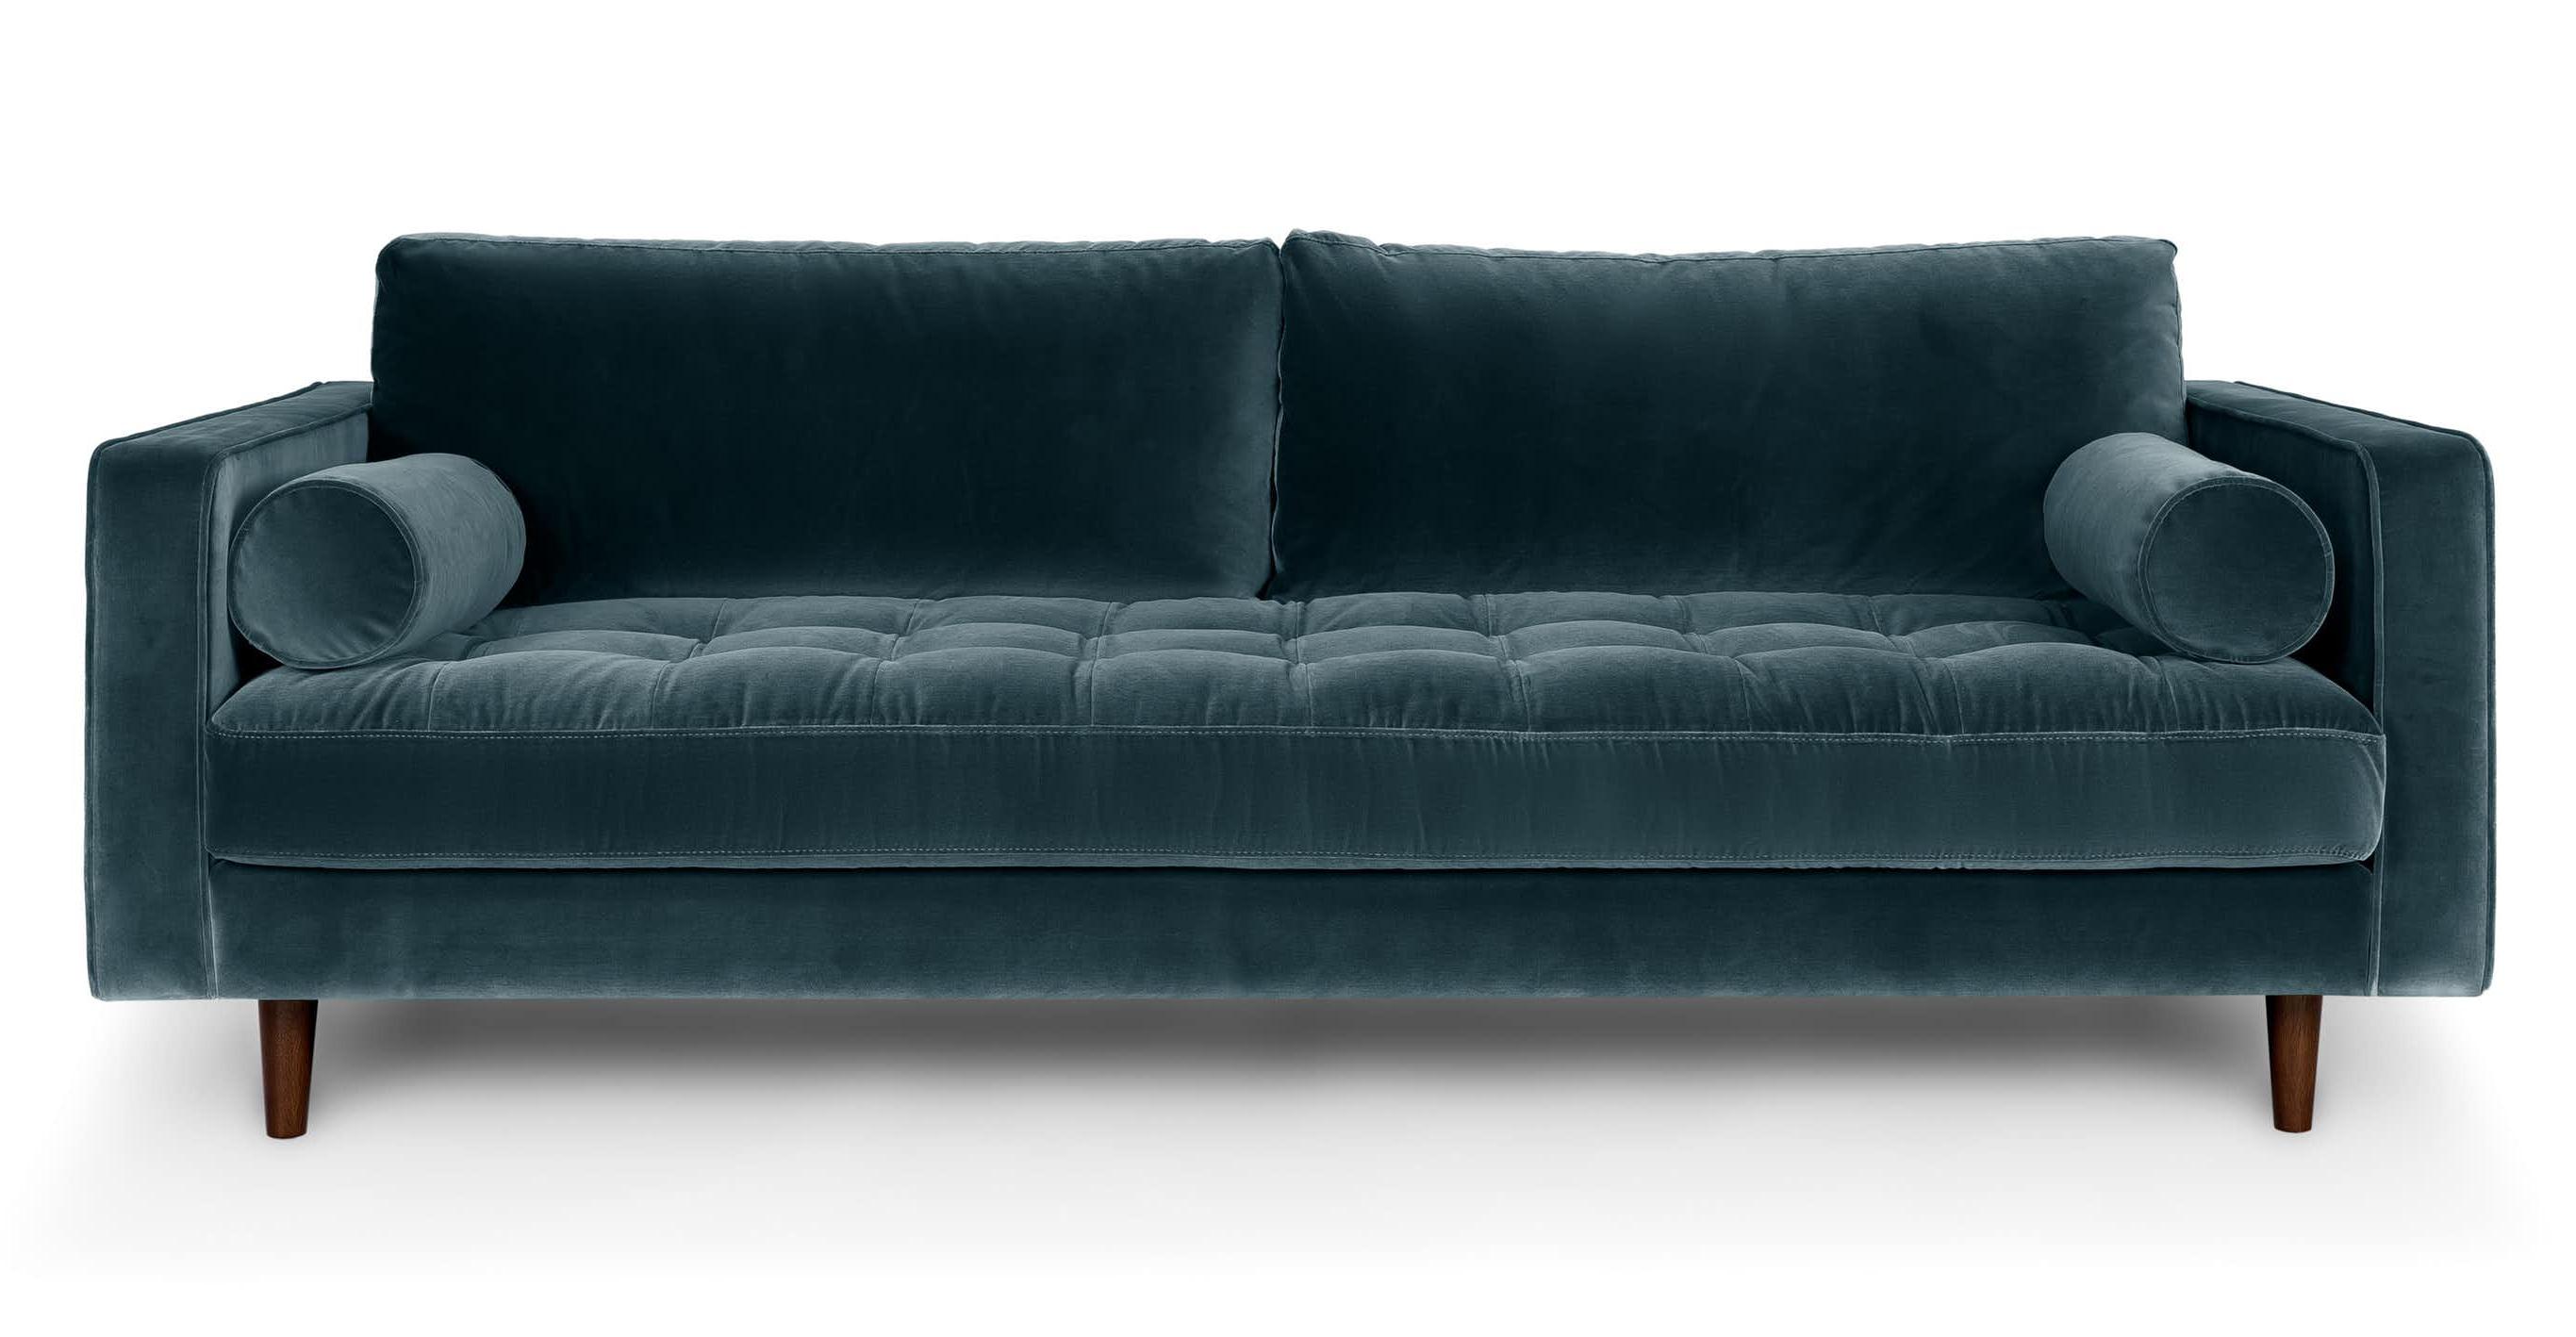 Sofa Black Friday 87dx Winner Winner Article S Black Friday Deals Vintage Revivals